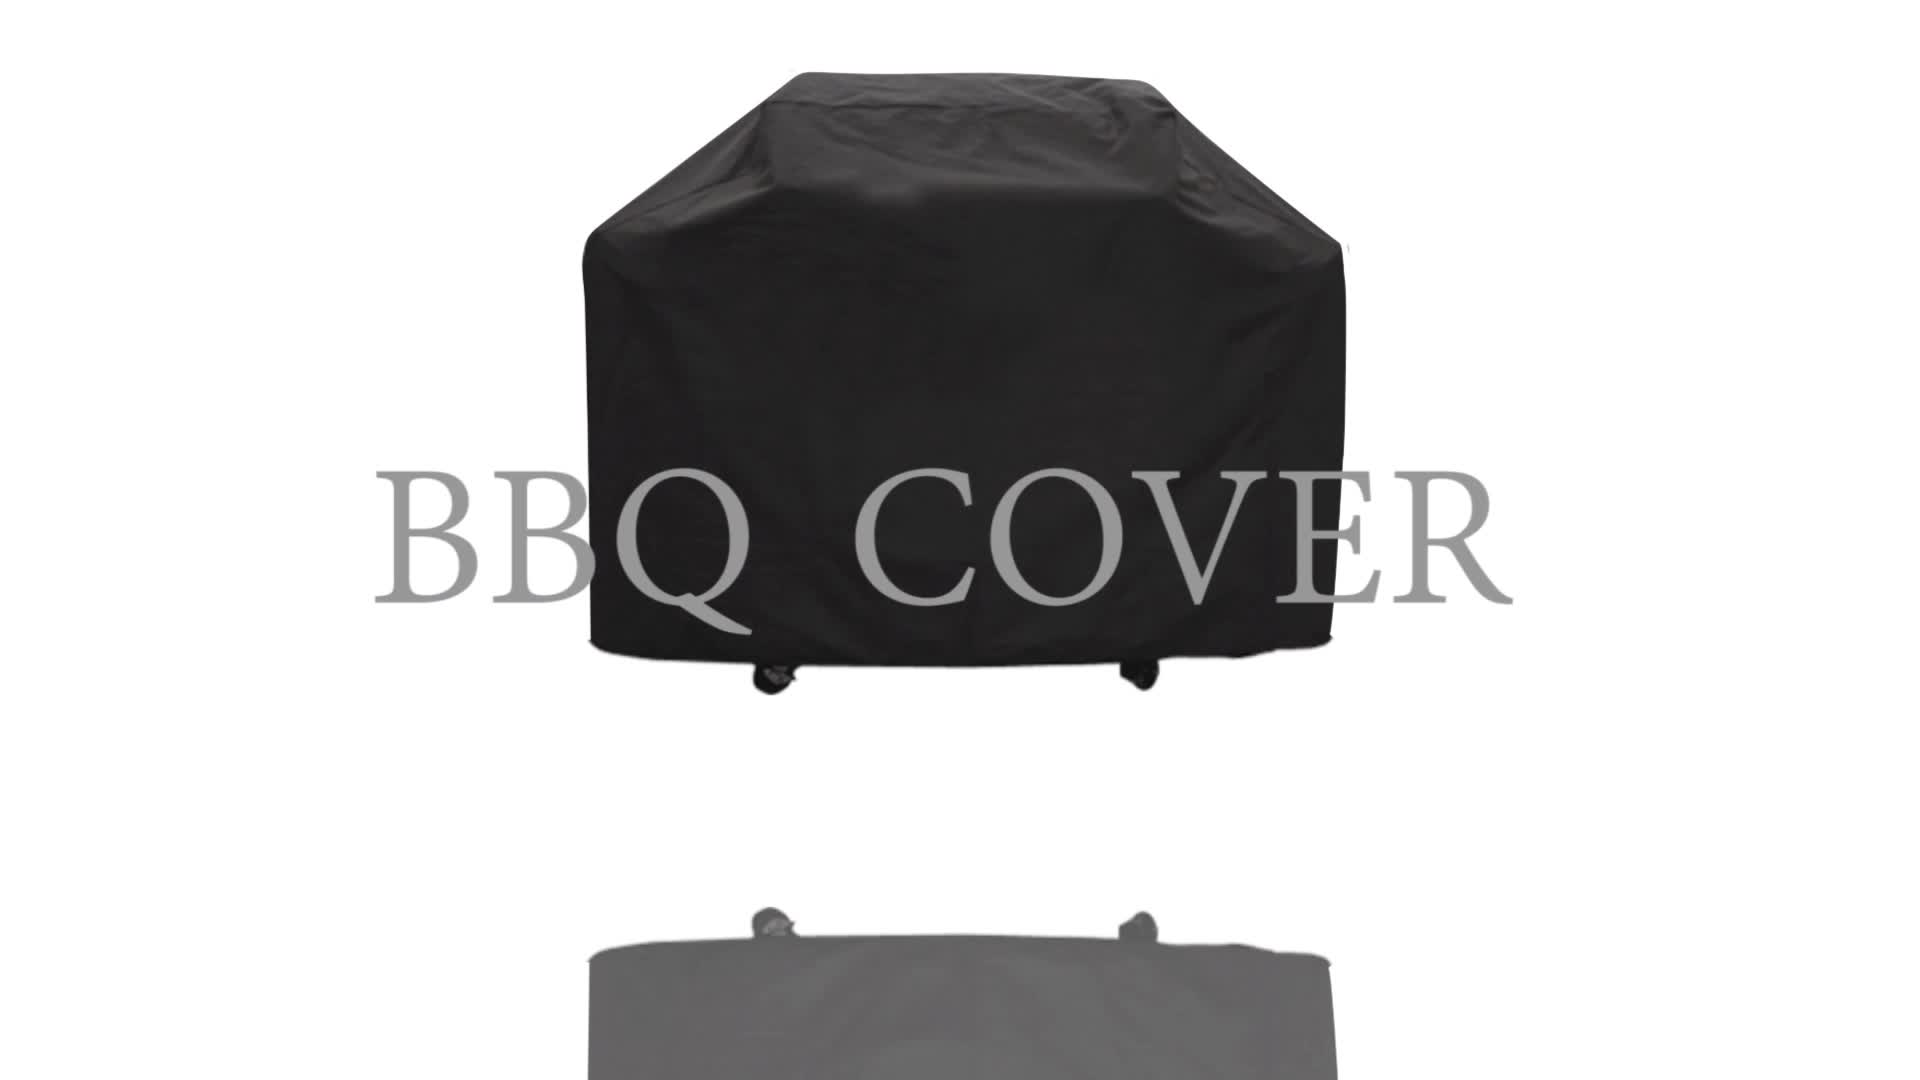 58 pulgadas 600D pesado impermeable anti-UV impermeable cubierta de barbacoa al aire libre barbacoa parrilla cubierta